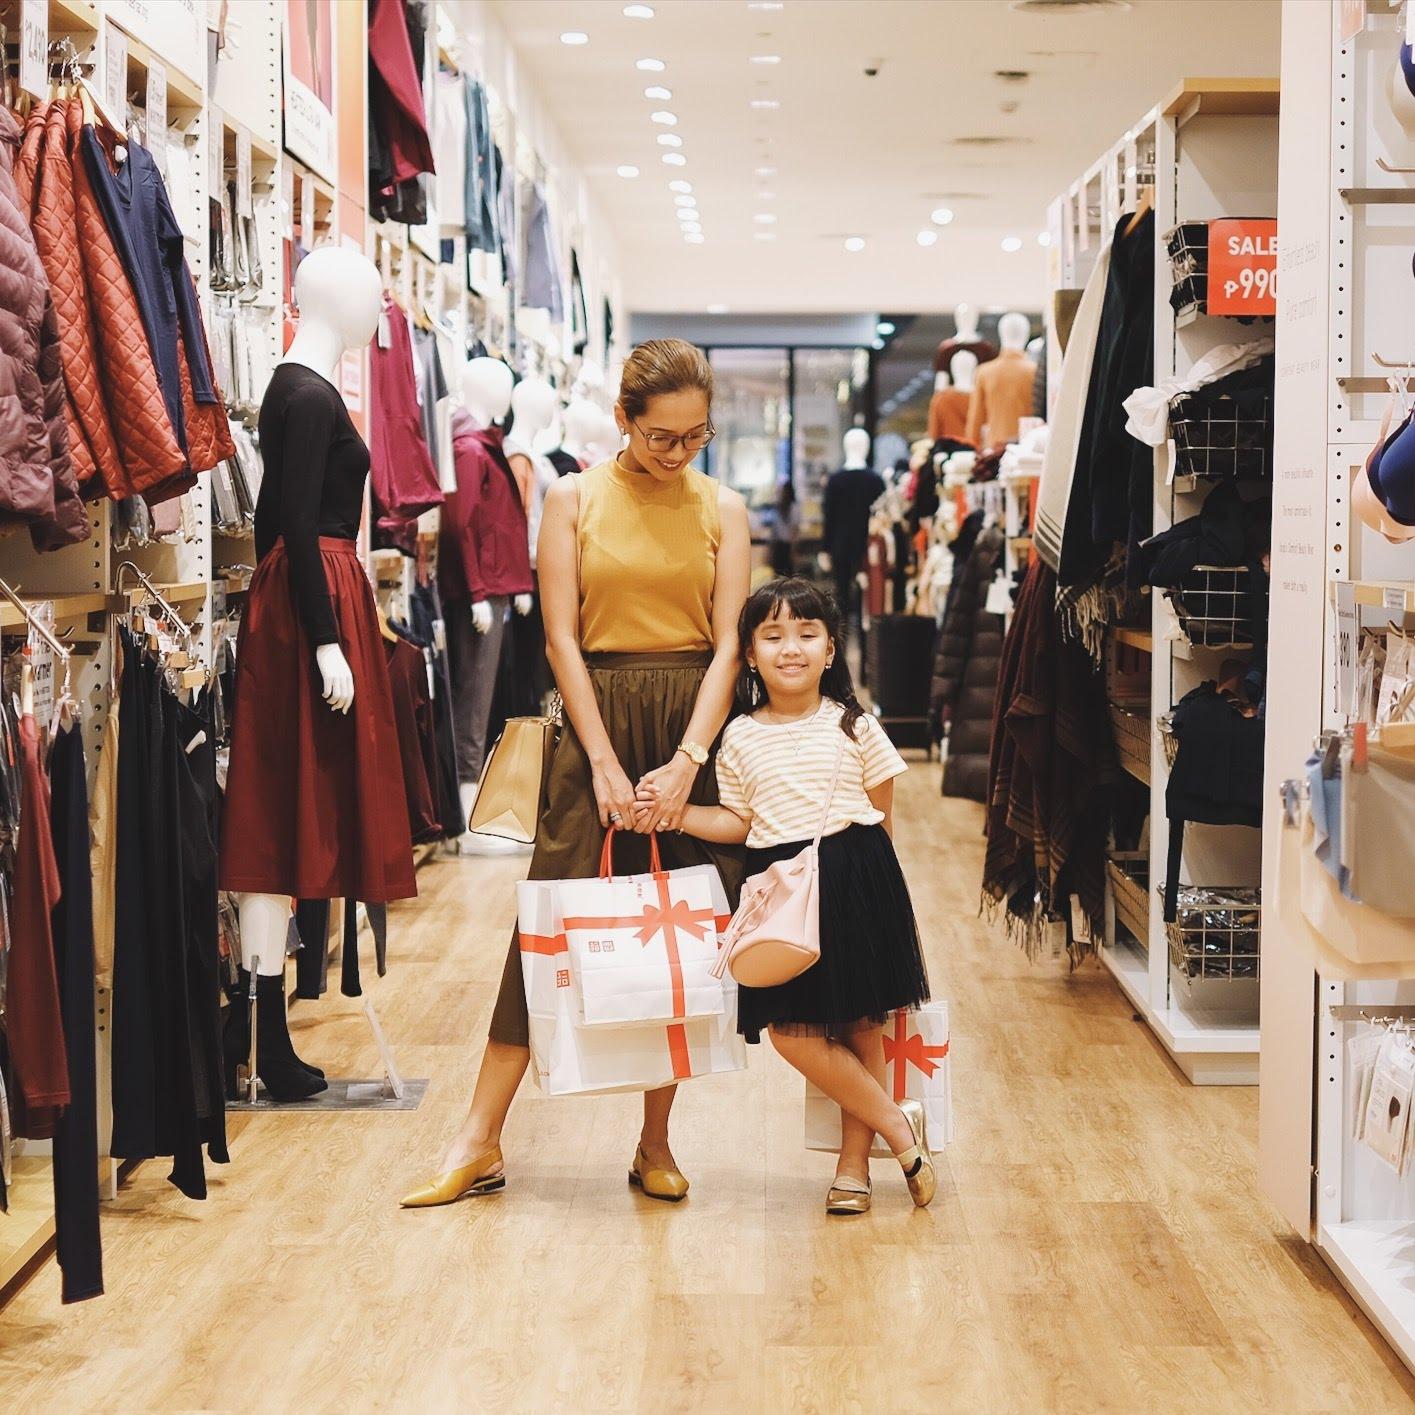 Cebu Fashion Bloggers, Cebu Bloggers, cebu beauty blogger, cebu beauty bloggers, cebu lifestyle bloggers, asian blogger, cebu, philippines, cebu influencer, social media influencer, philippine bloggers, philippine fashion bloggers, toni pino-oca, Cebu Fashion Bloggers network, cebu fashion blogger, cebu bloggers society, cebu blogger, online shopping, fujifilm philippines, fujifilm xt-10, cebu style blogger, cebu style bloggers, cebu style blog, cebu mommy blogger, cebu mommy bloggers, cebu digital influencer, uniqlo philippines influencer, uniqlo cebu influencer